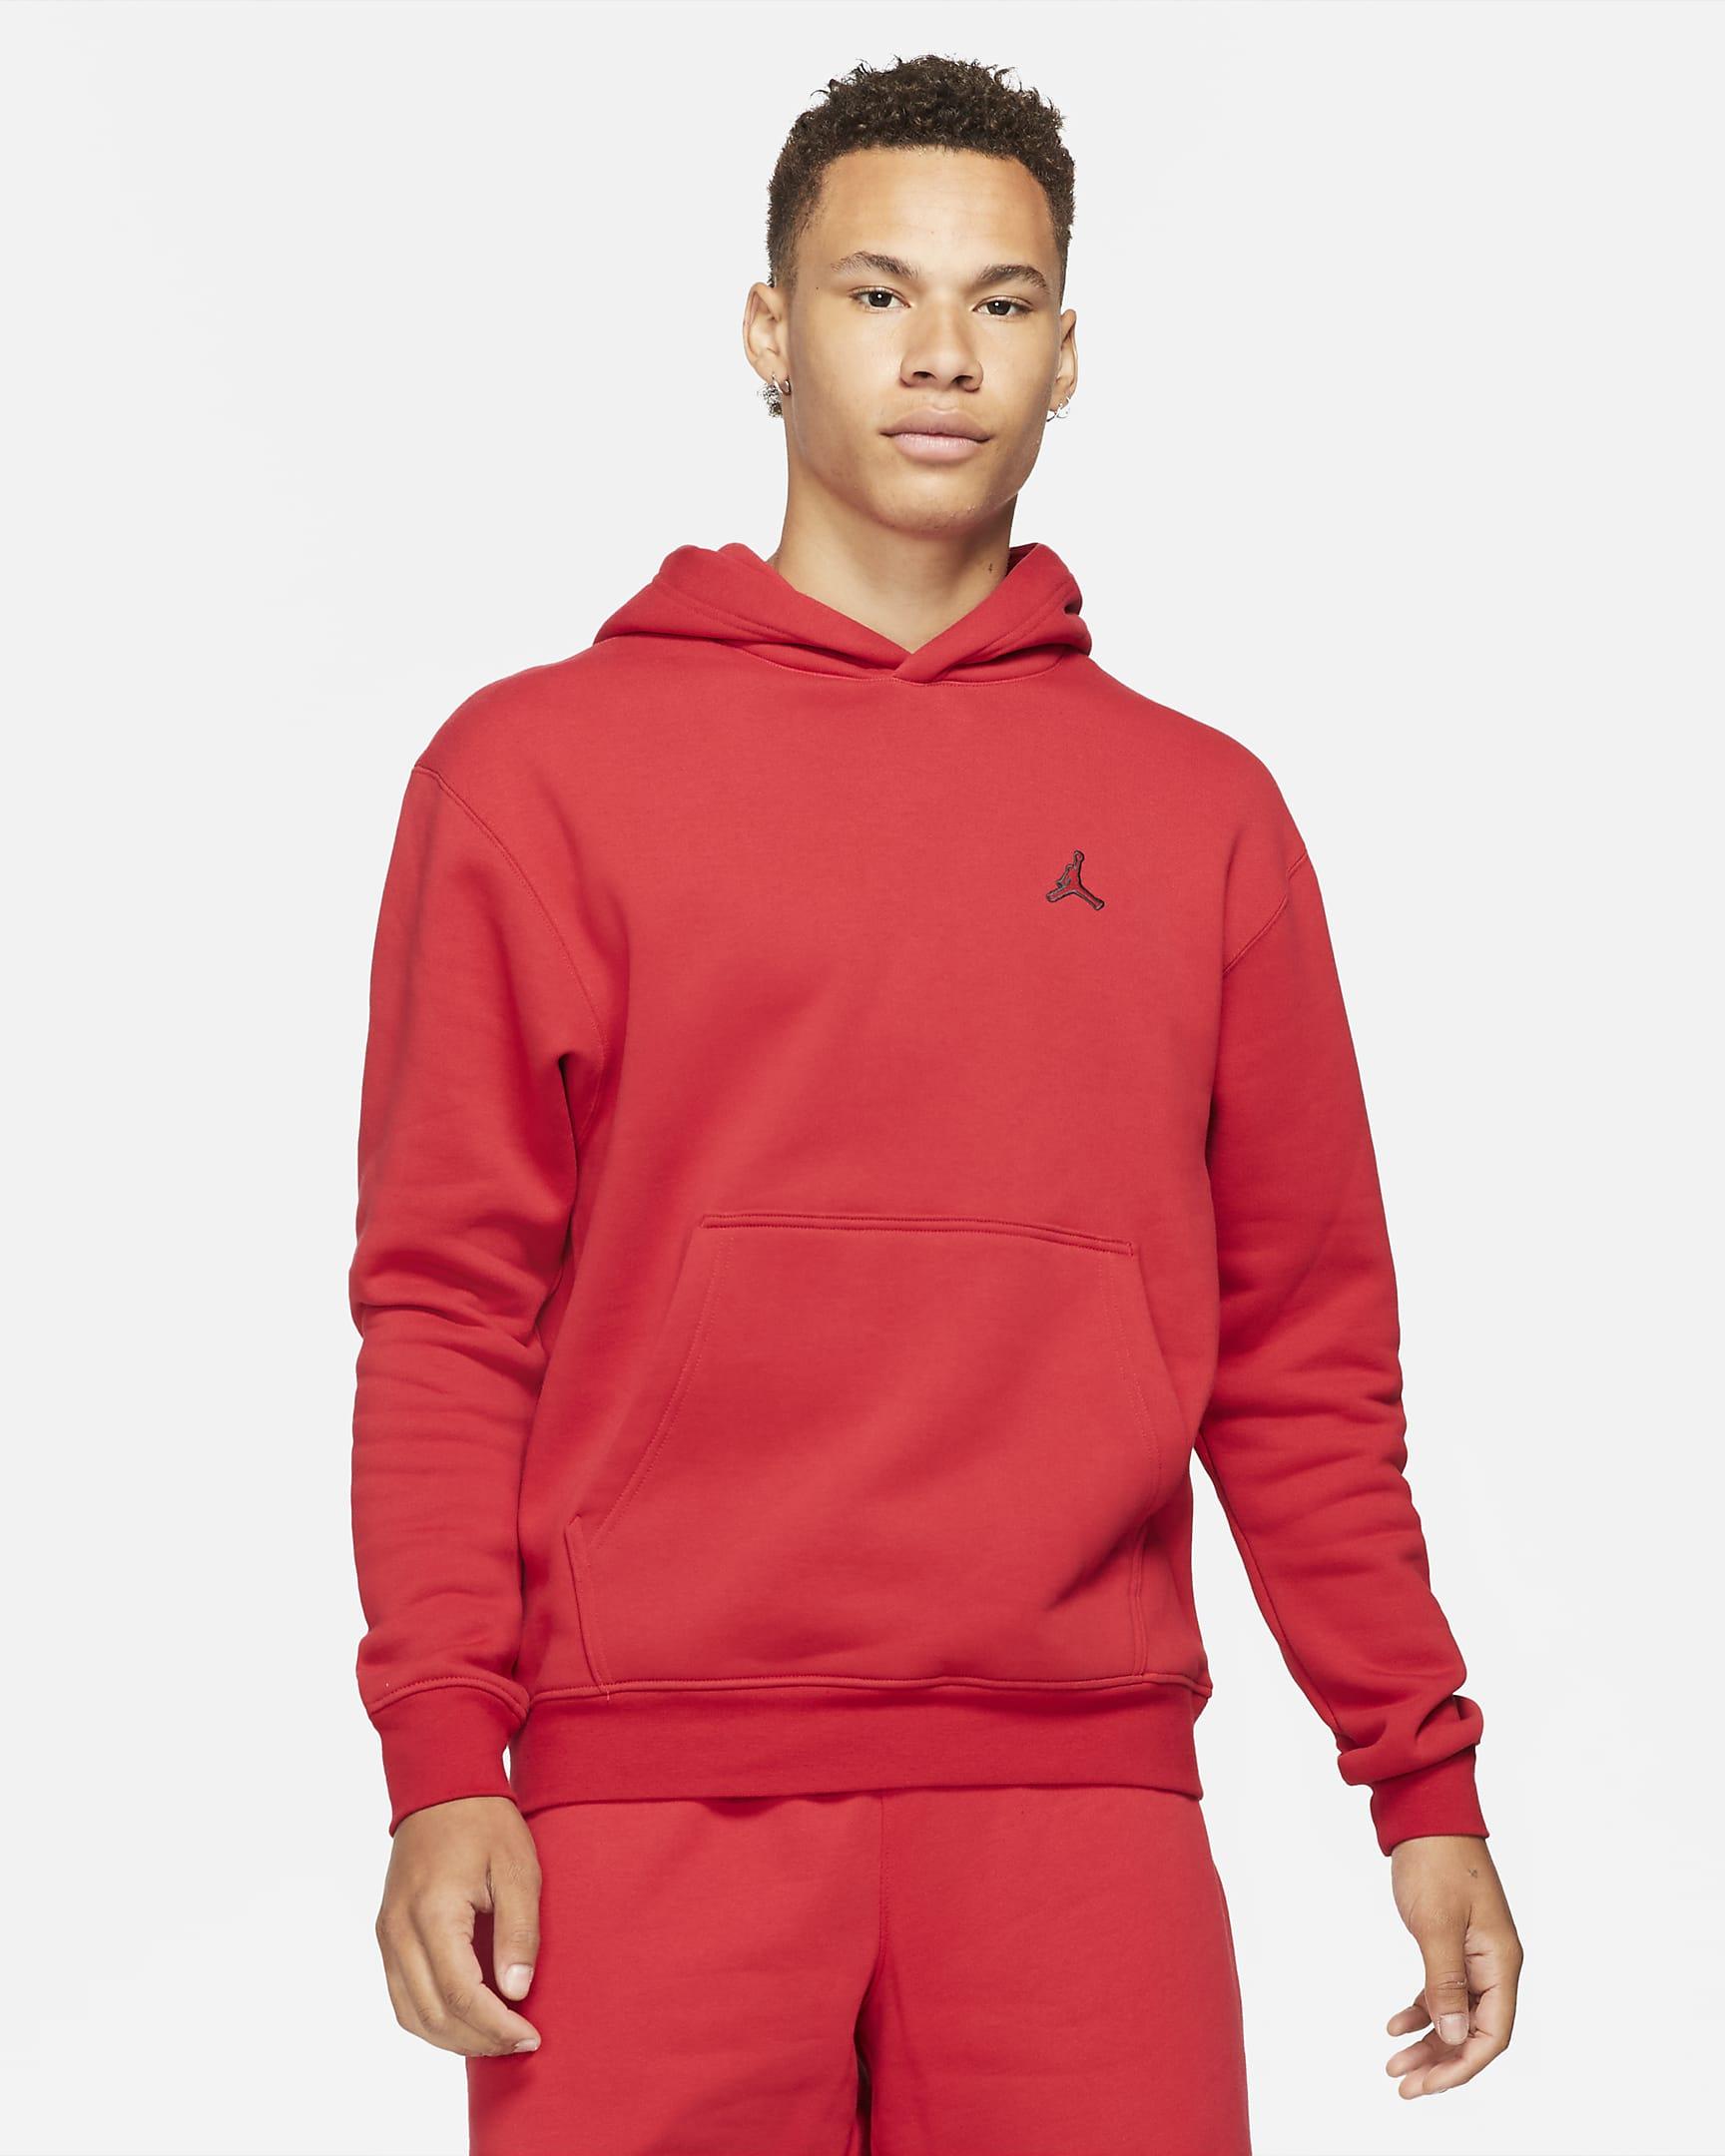 jordan-essentials-mens-fleece-pullover-hoodie-jG54lf.png